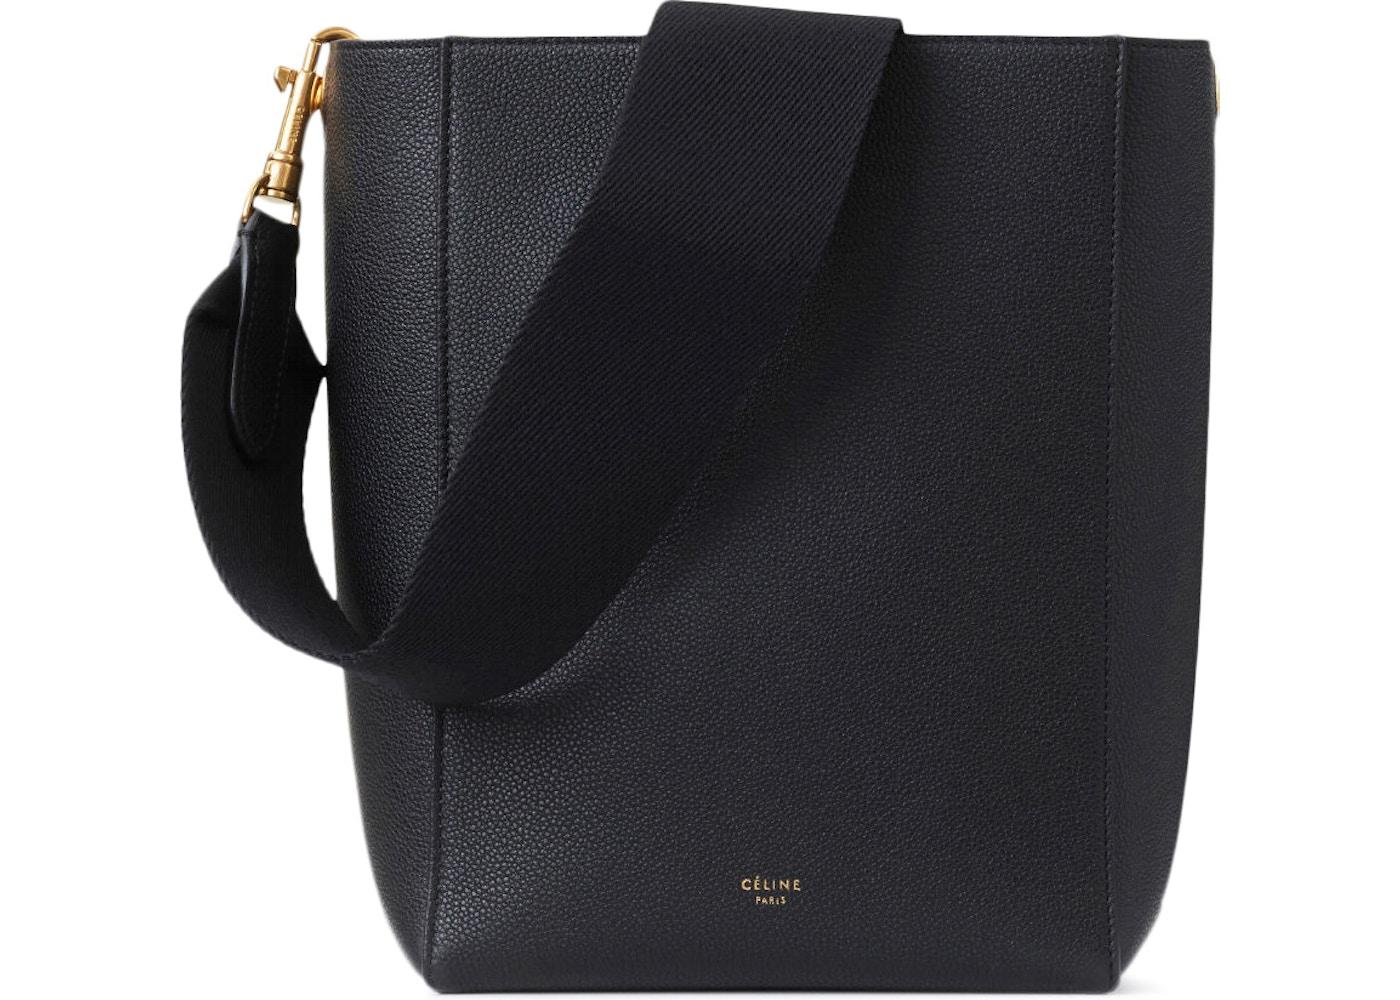 2726a54d0d4b Buy   Sell Celine Handbags - New Highest Bids